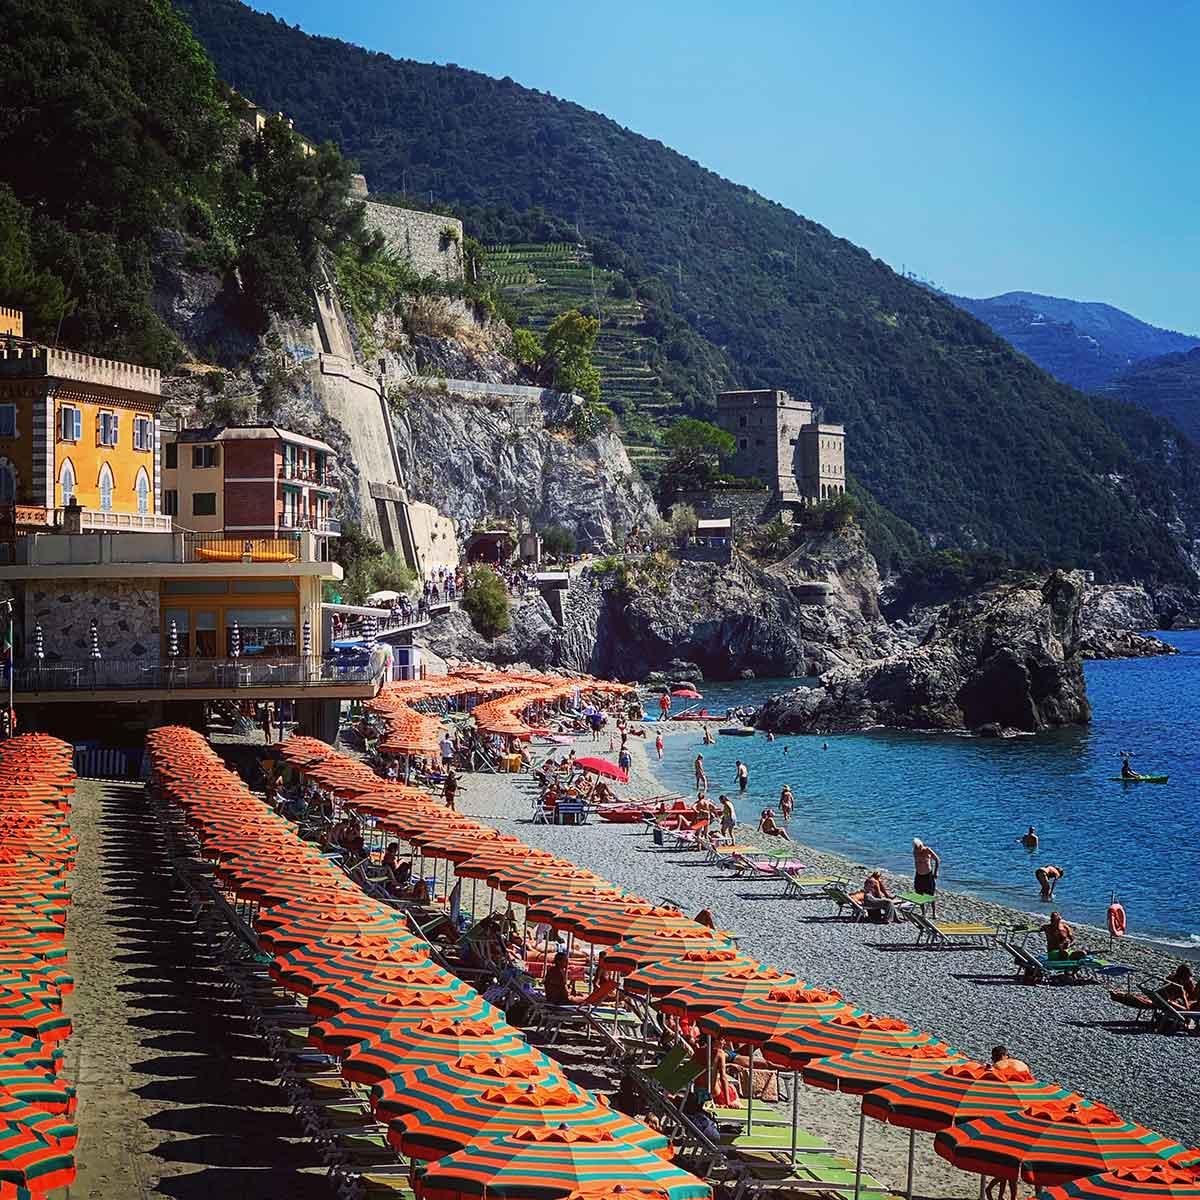 Monterosso al Mare in Cinque Terre, Italy